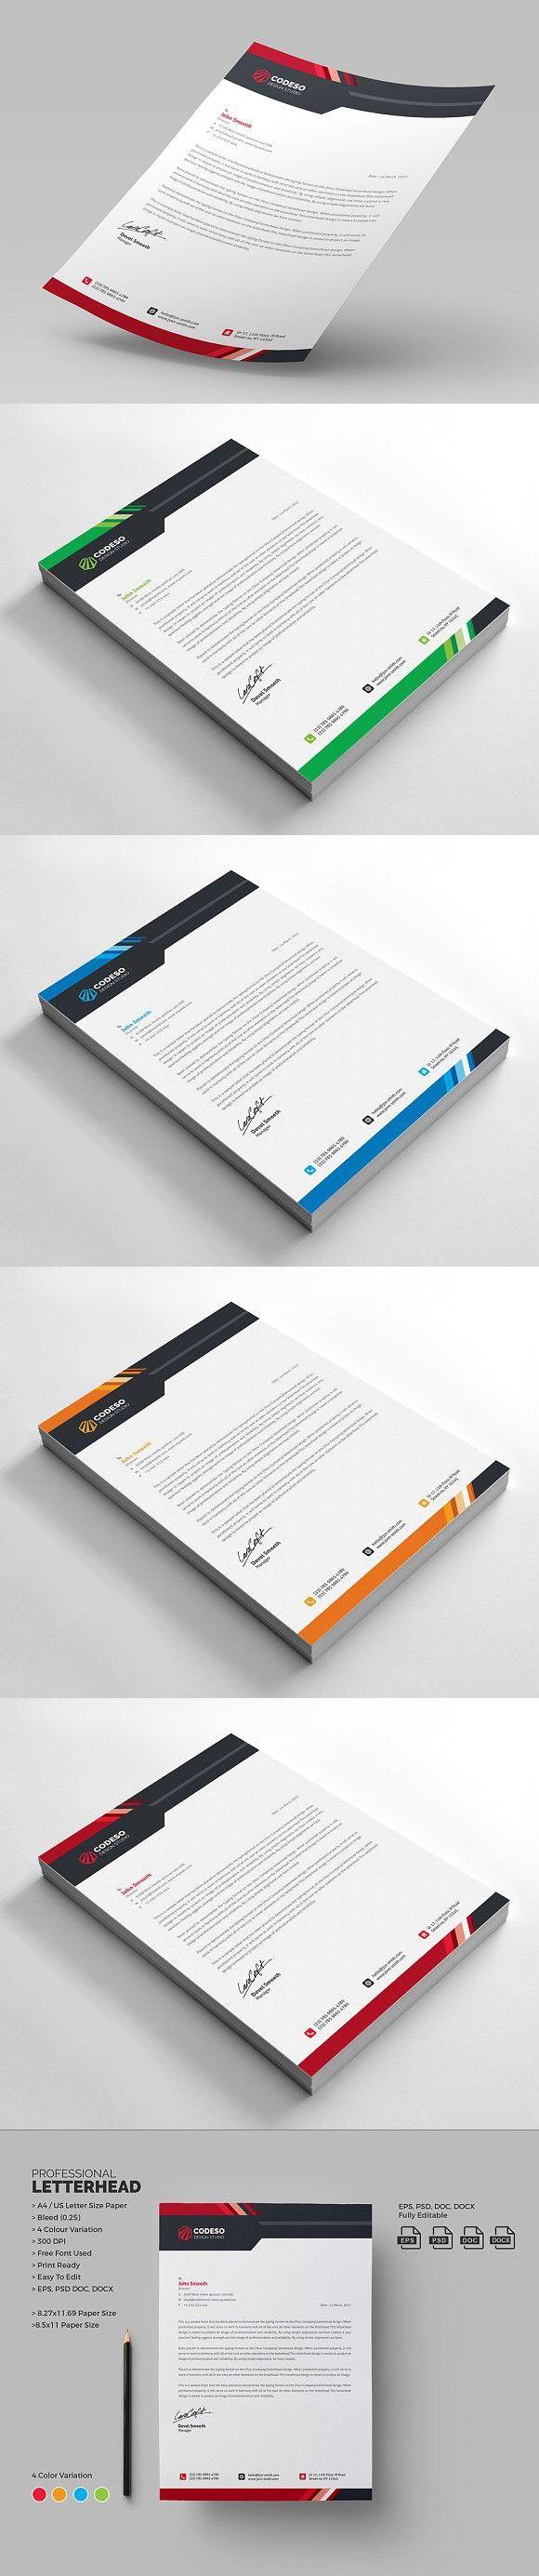 Corporate Letterhead. Stationery Templates